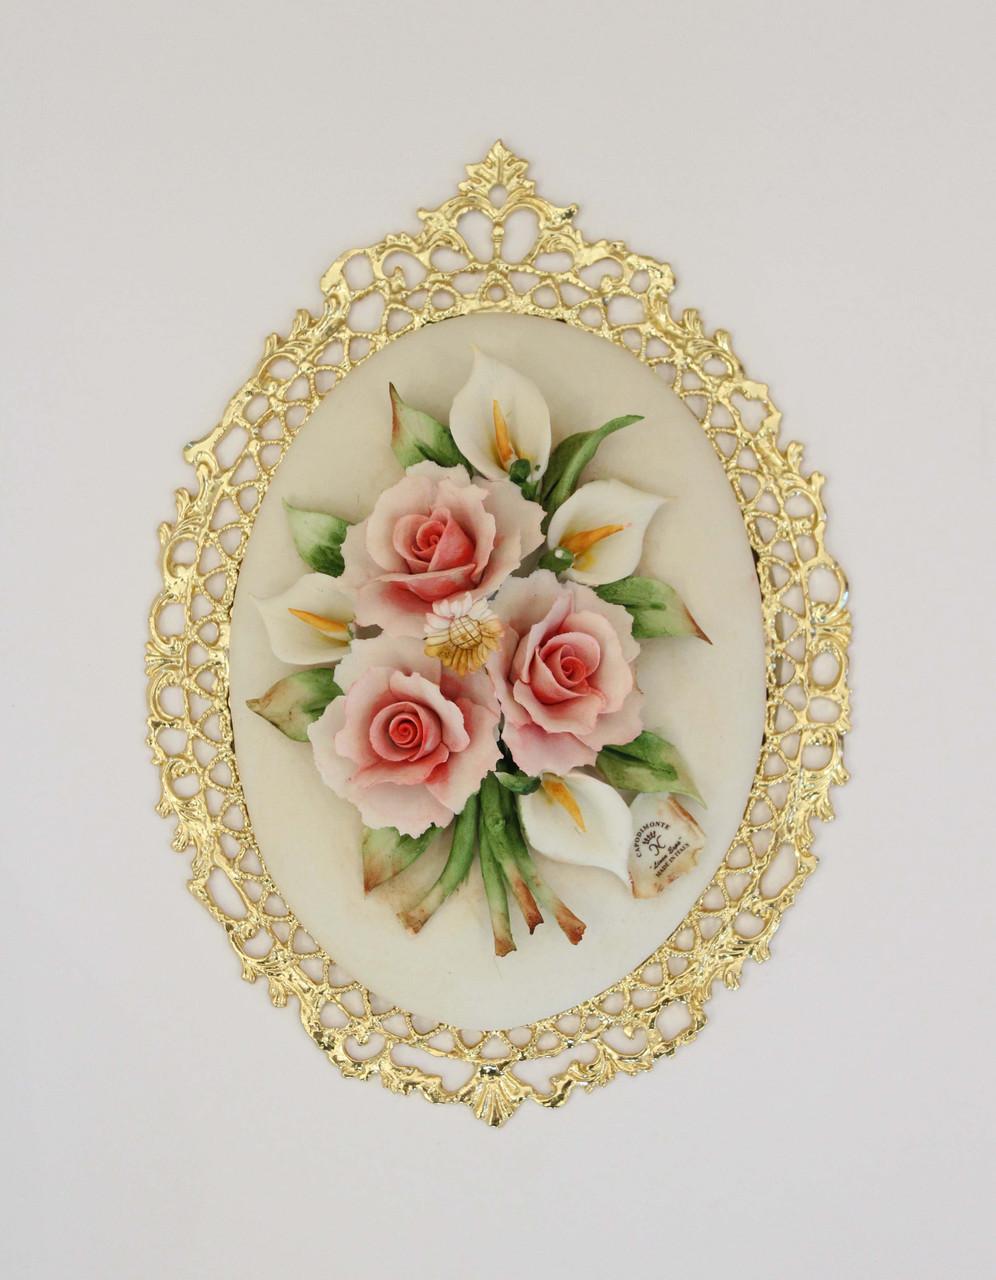 Декоративное панно с цветами. Фарфор. Ручная работа. Италия